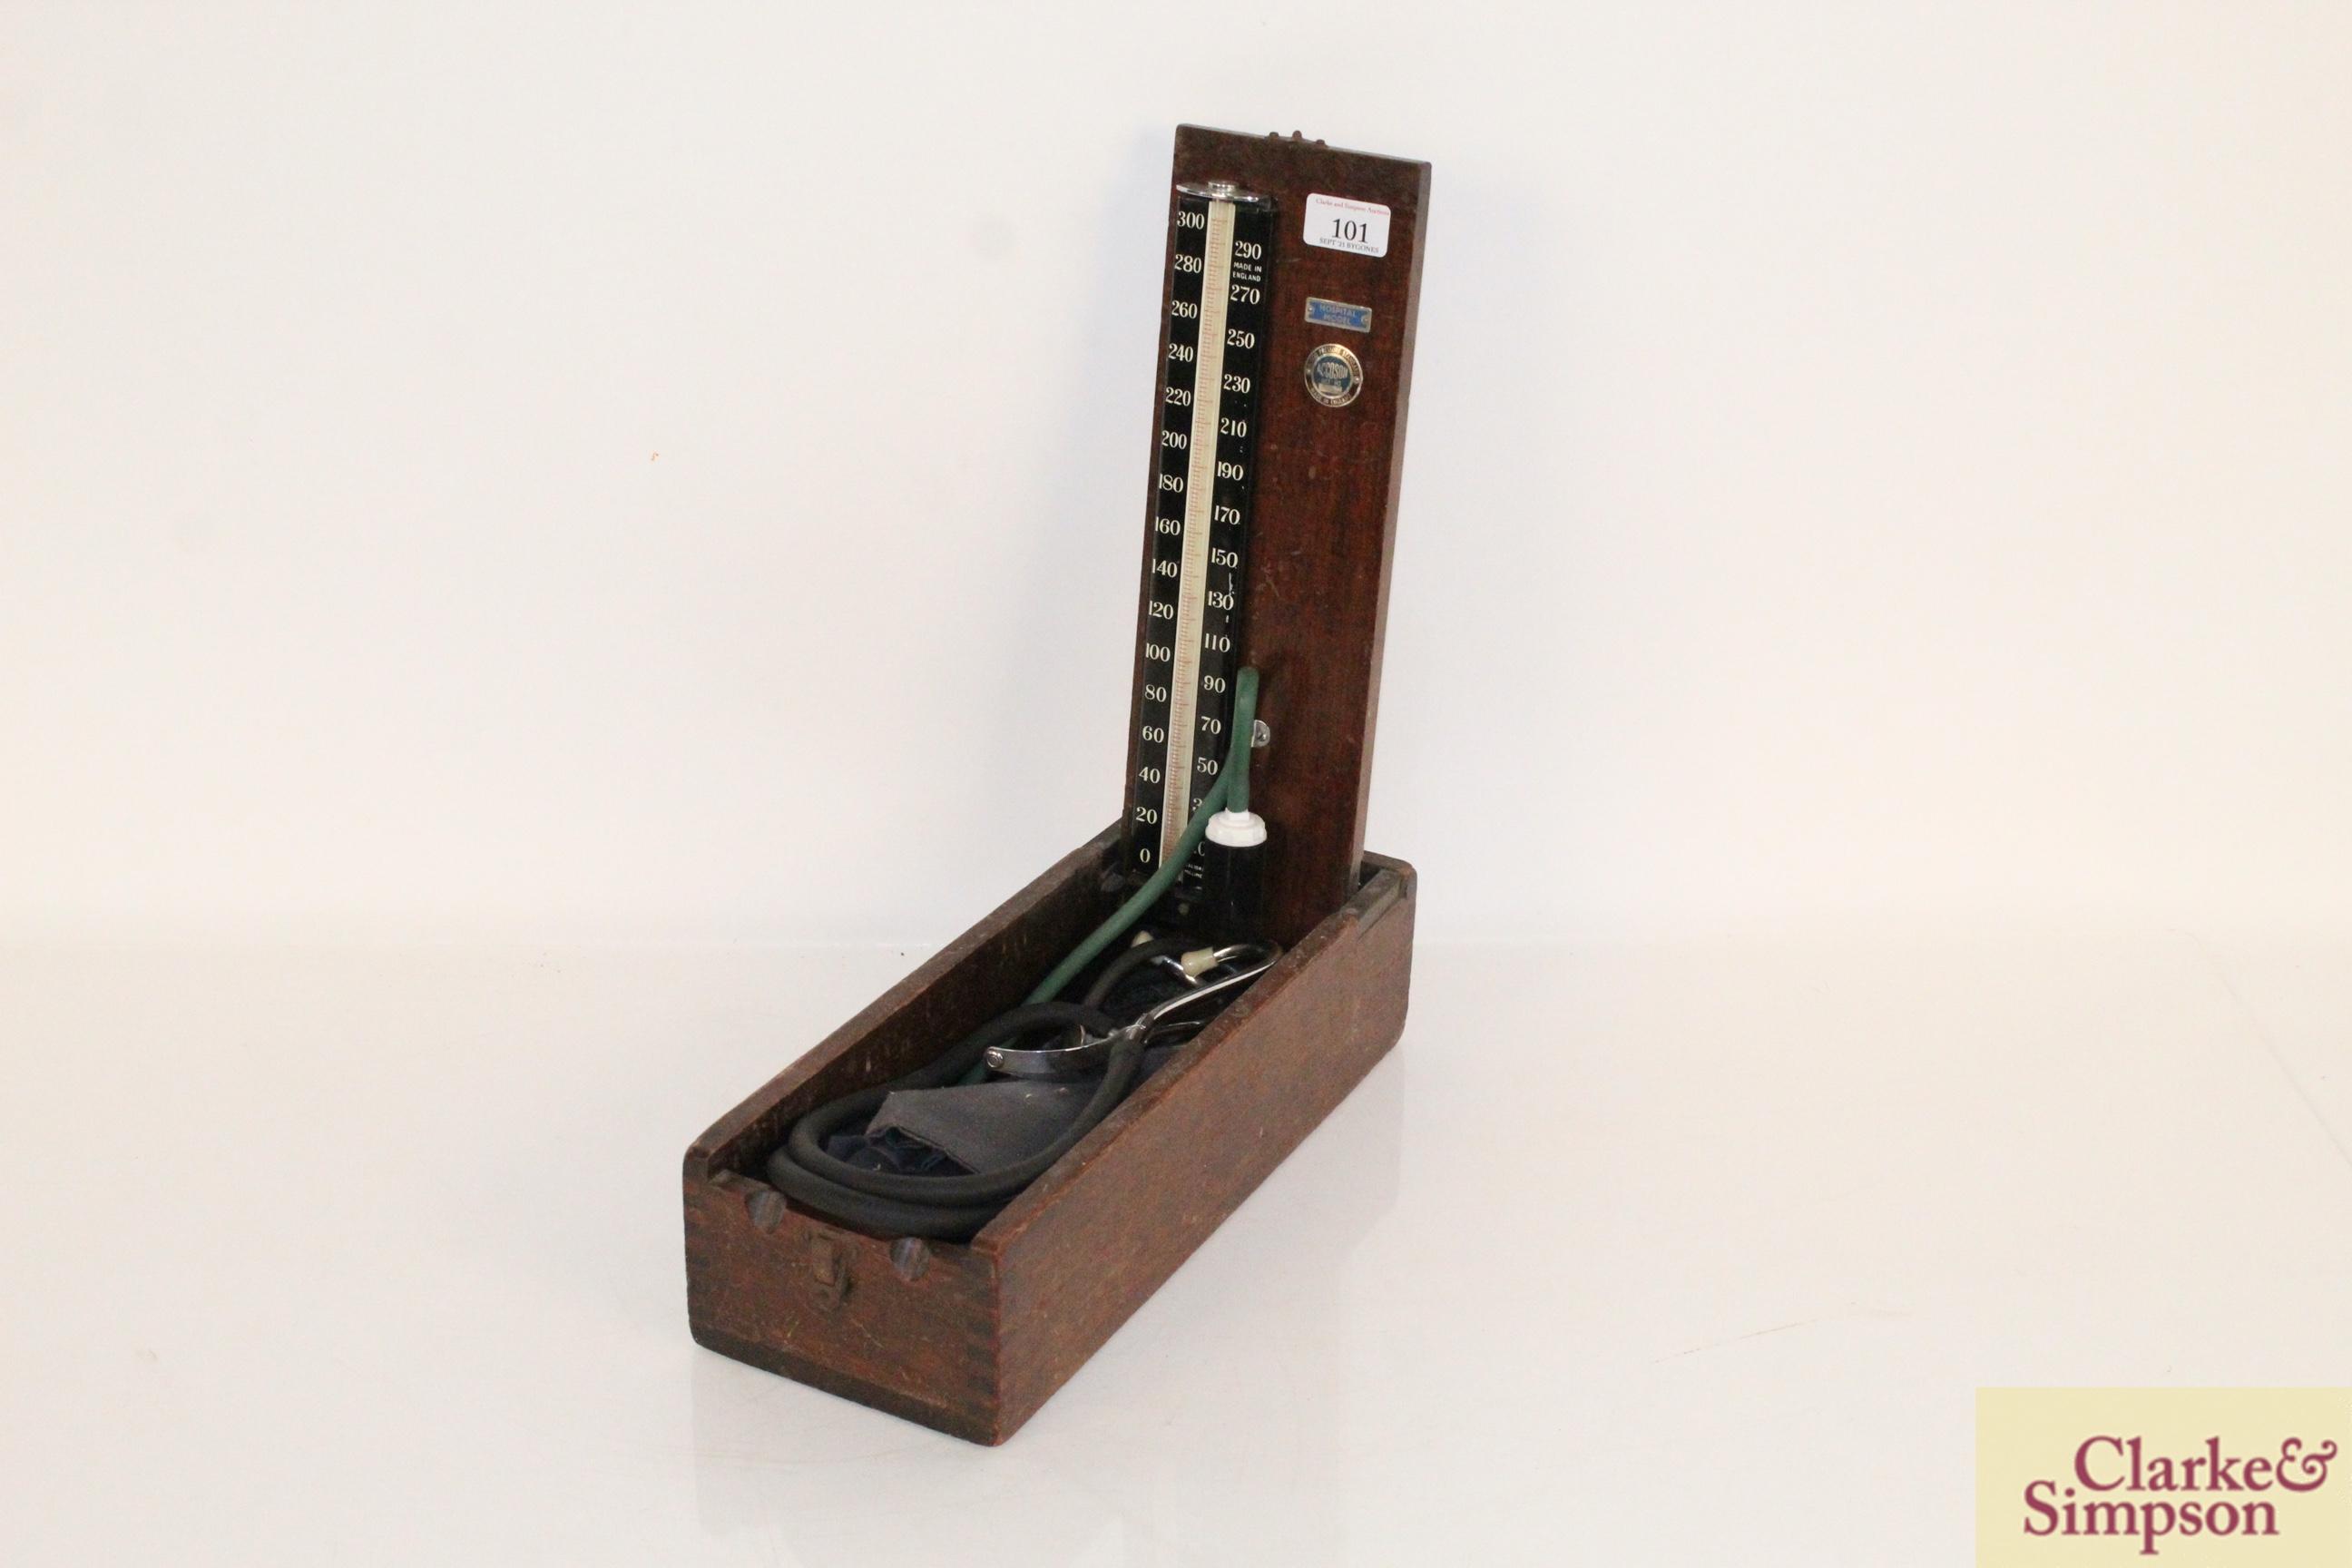 A vintage wooden boxed blood pressure gauge by Accos